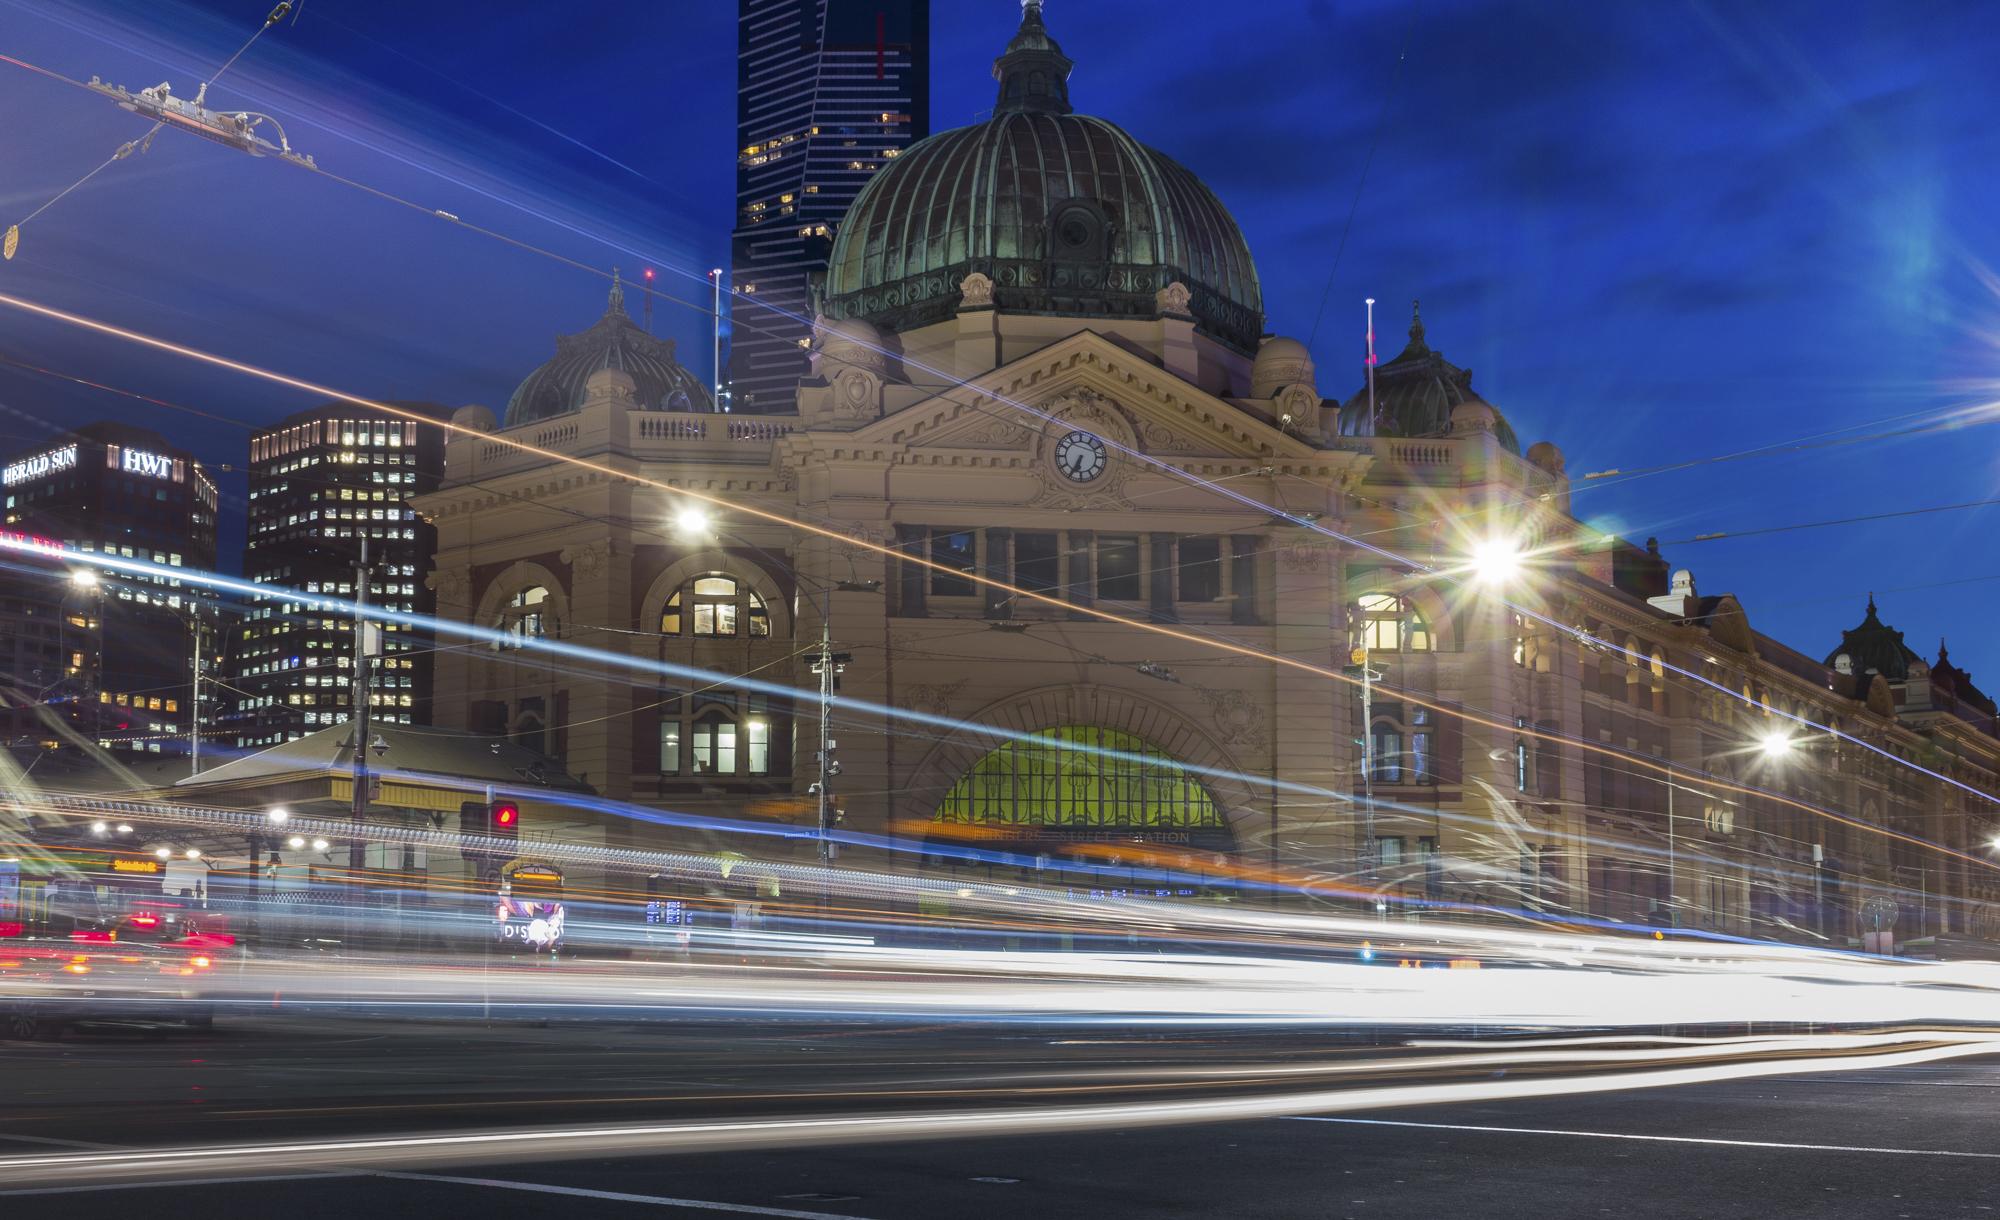 Flinders Street Railway Station. Melbourne, Australia 2018.  ©  Danny Imson. Leica CL, Leica Summicron-TL 23mm F/2 ASPH